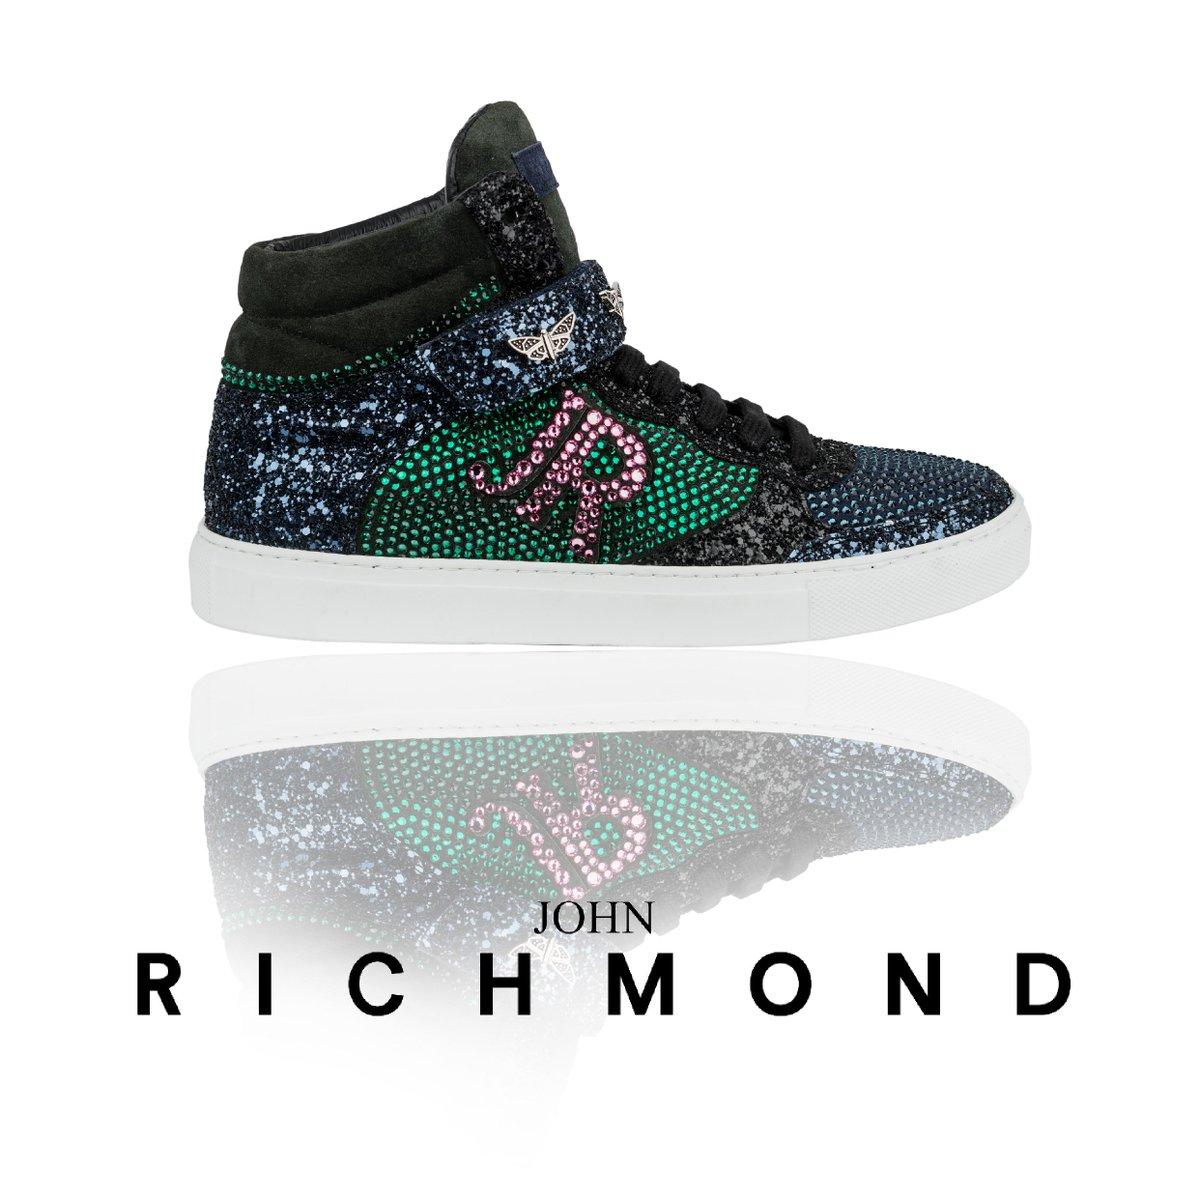 #johnrichmondofficial #shoes #sneakers #fw1516 #sparkling #glitter #fashion #glam https://t.co/J5qZpmkUIF